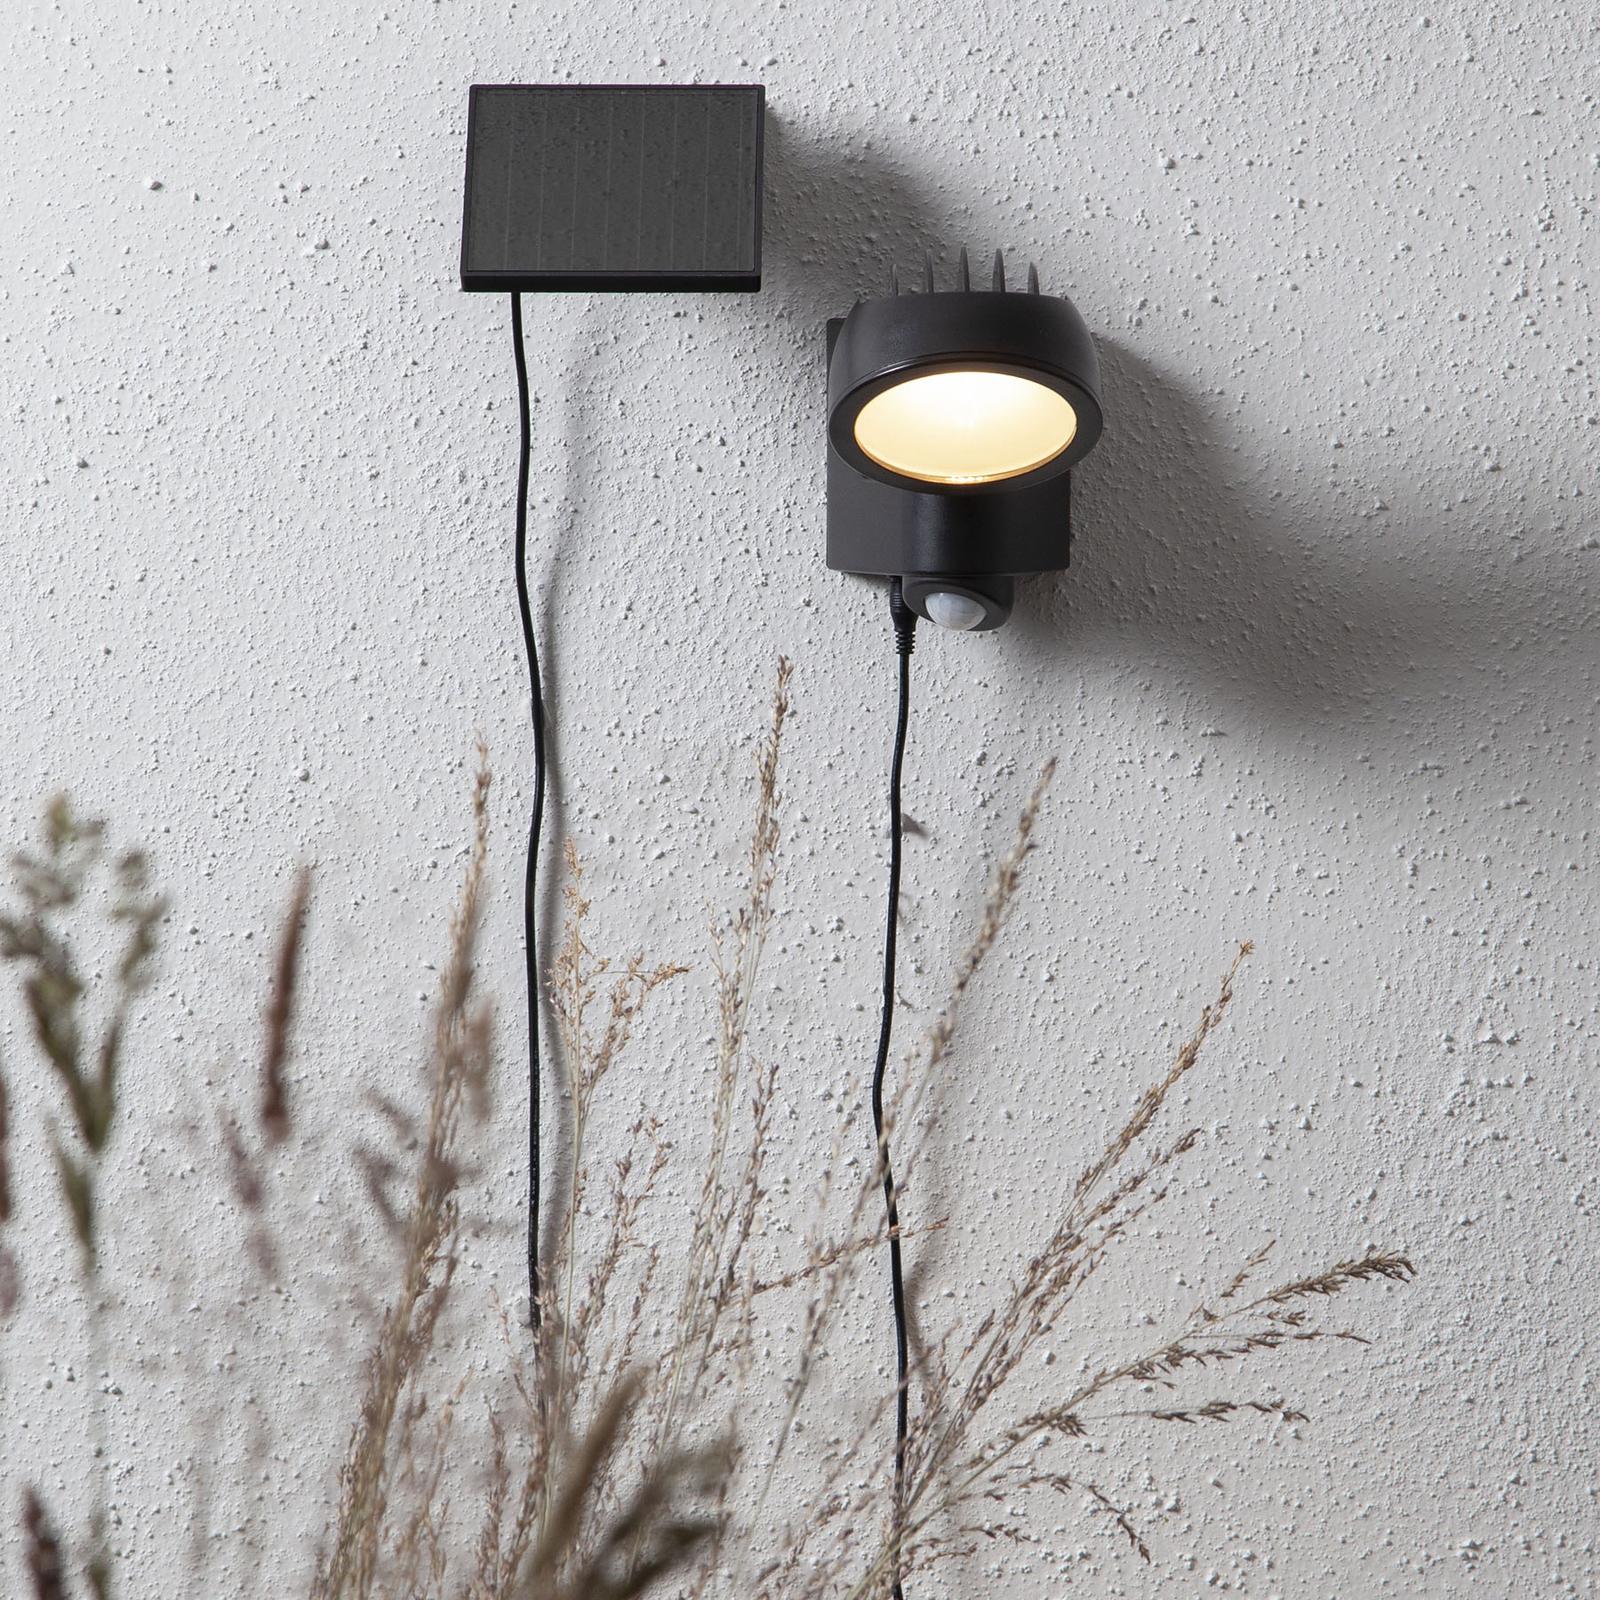 Lampa solarna LED Powerspot Sensor, okrągła, 150lm